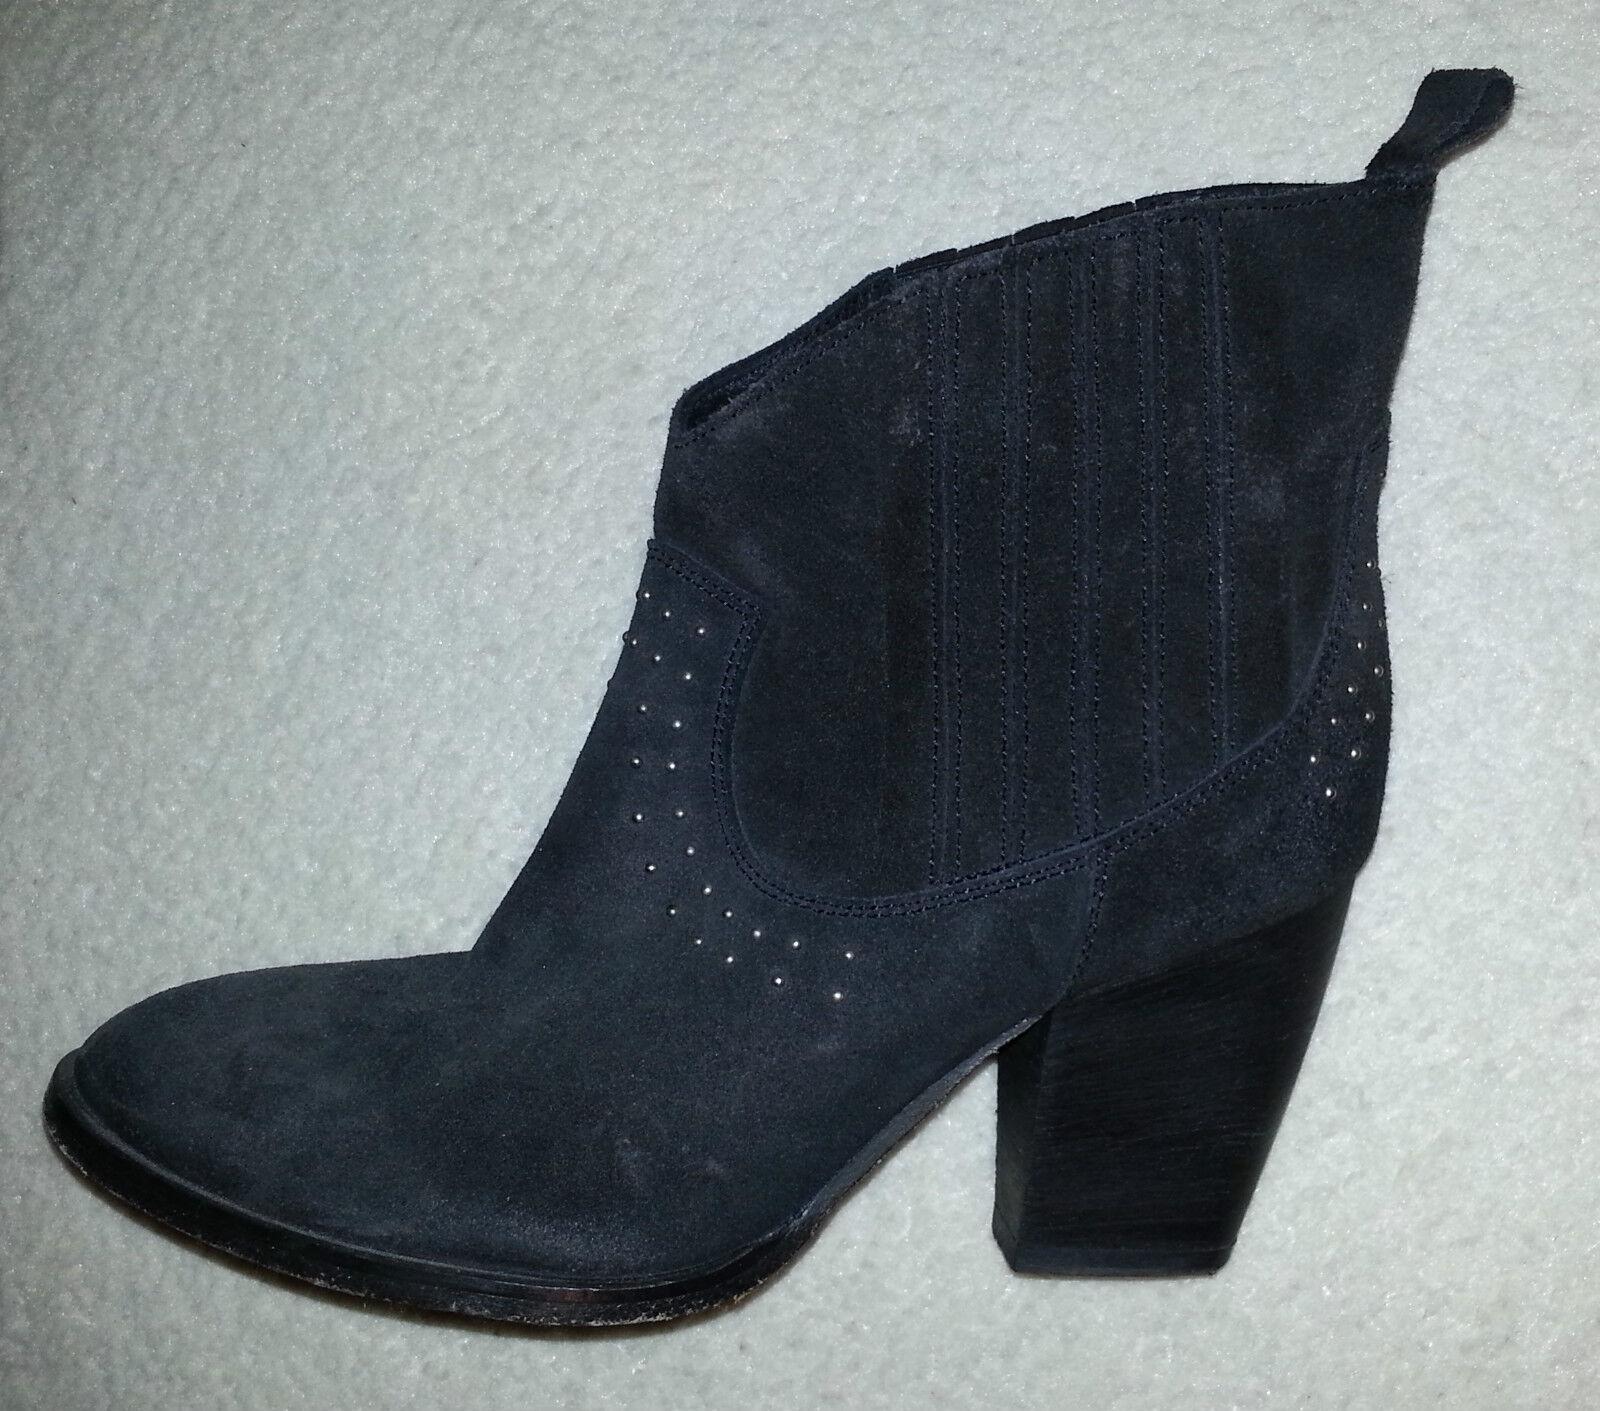 Pied A A Pied Terre Negro botas De Gamuza Talla 5 e50c5f